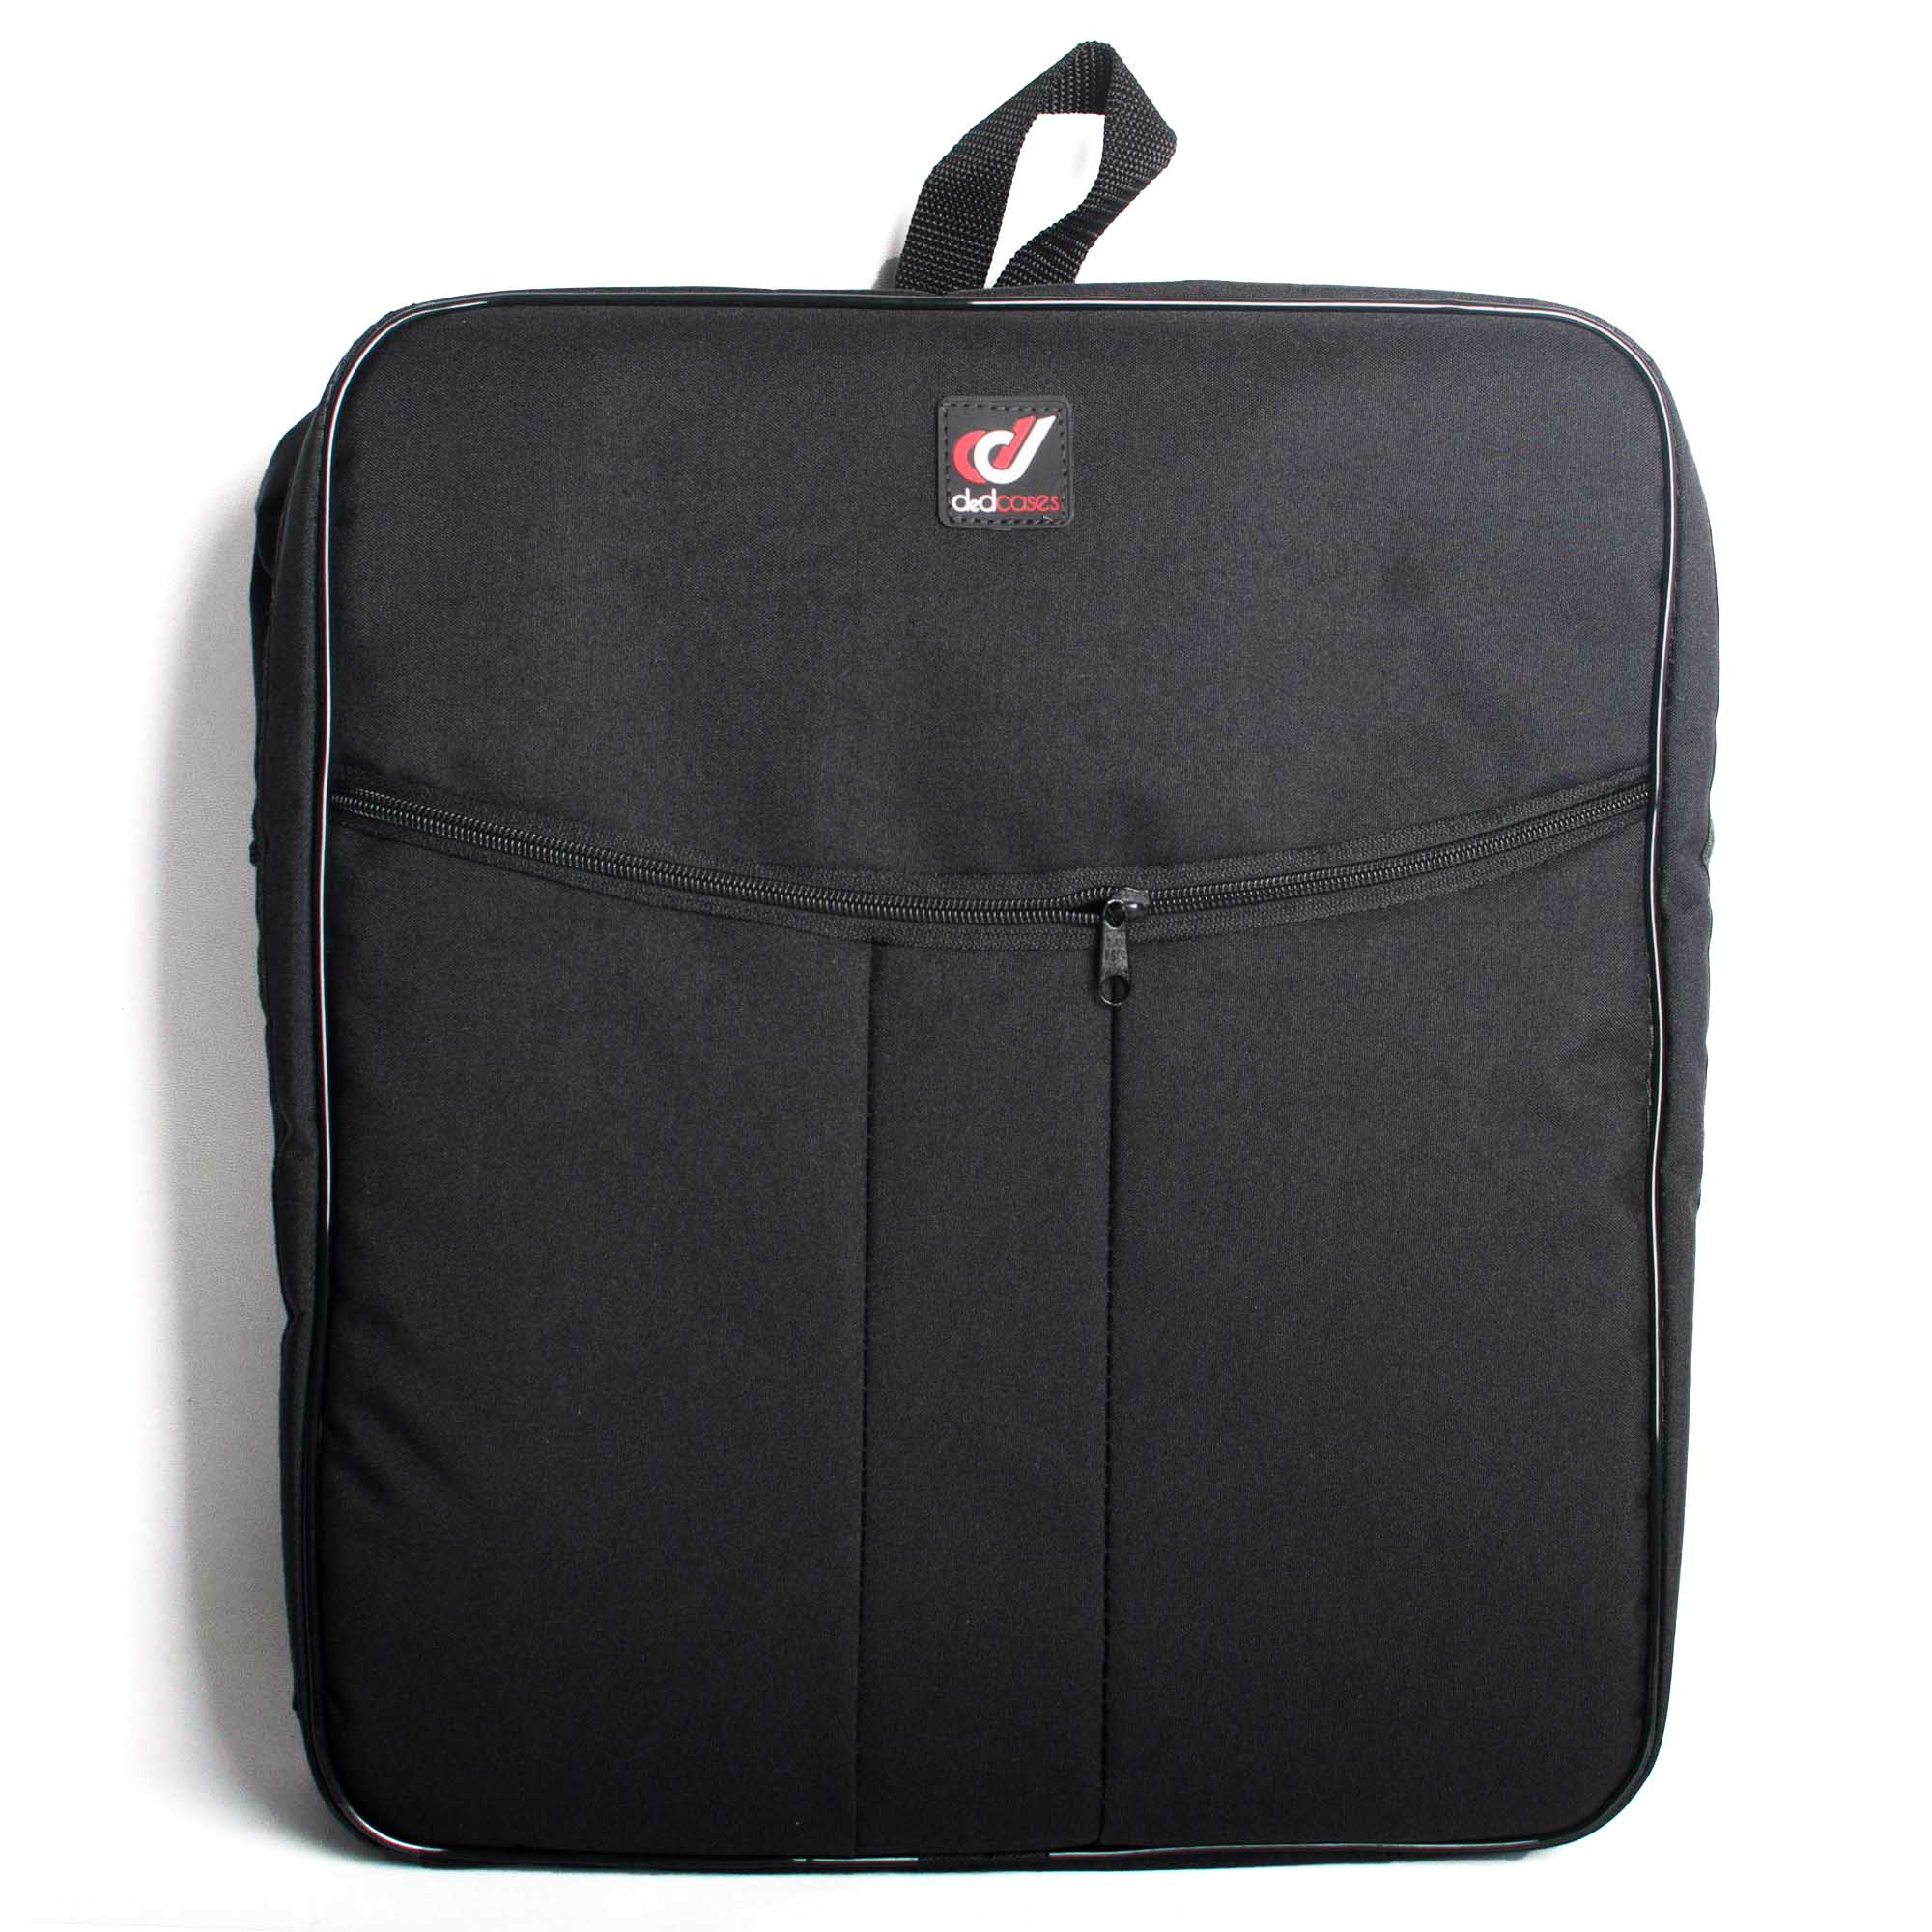 Mochila Maleta Bag Pack Top Case Drone Phantom 4